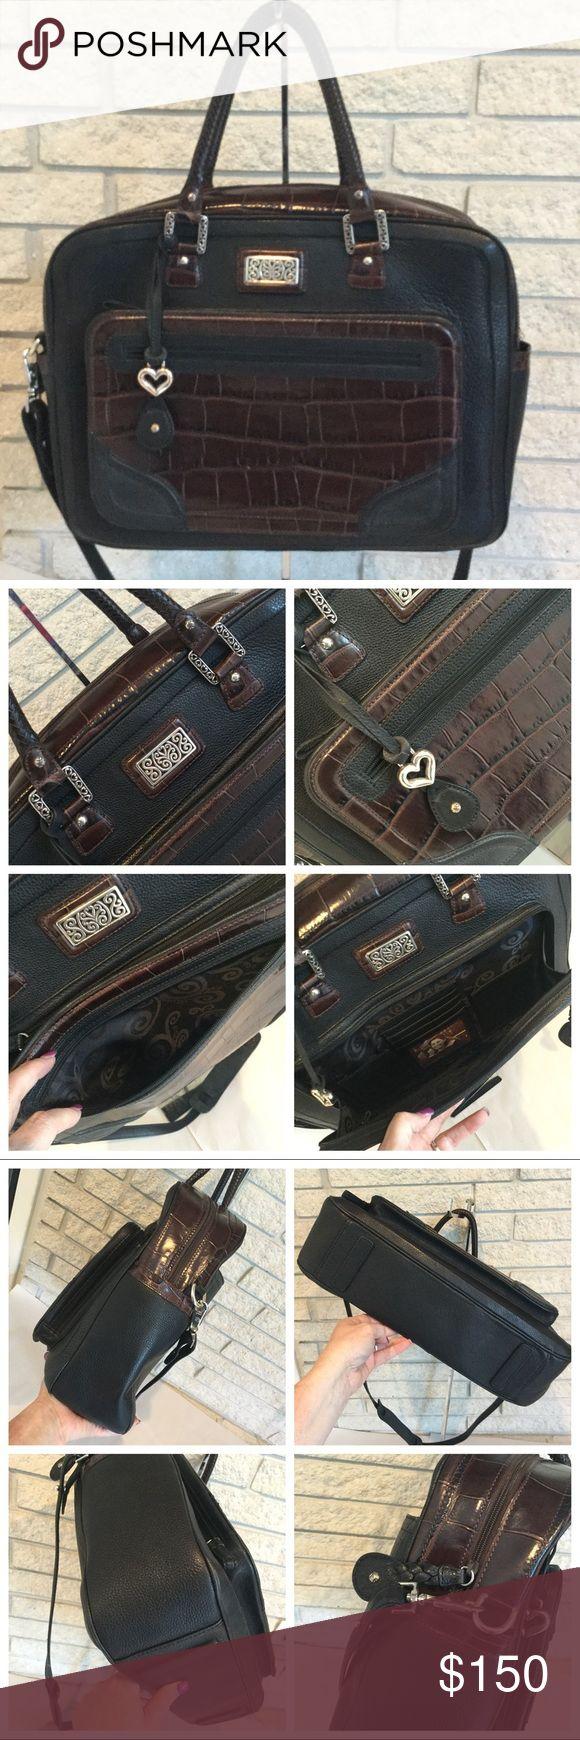 NWOT Brighton Leather Laptop Briefcase Bag NWOT Br…